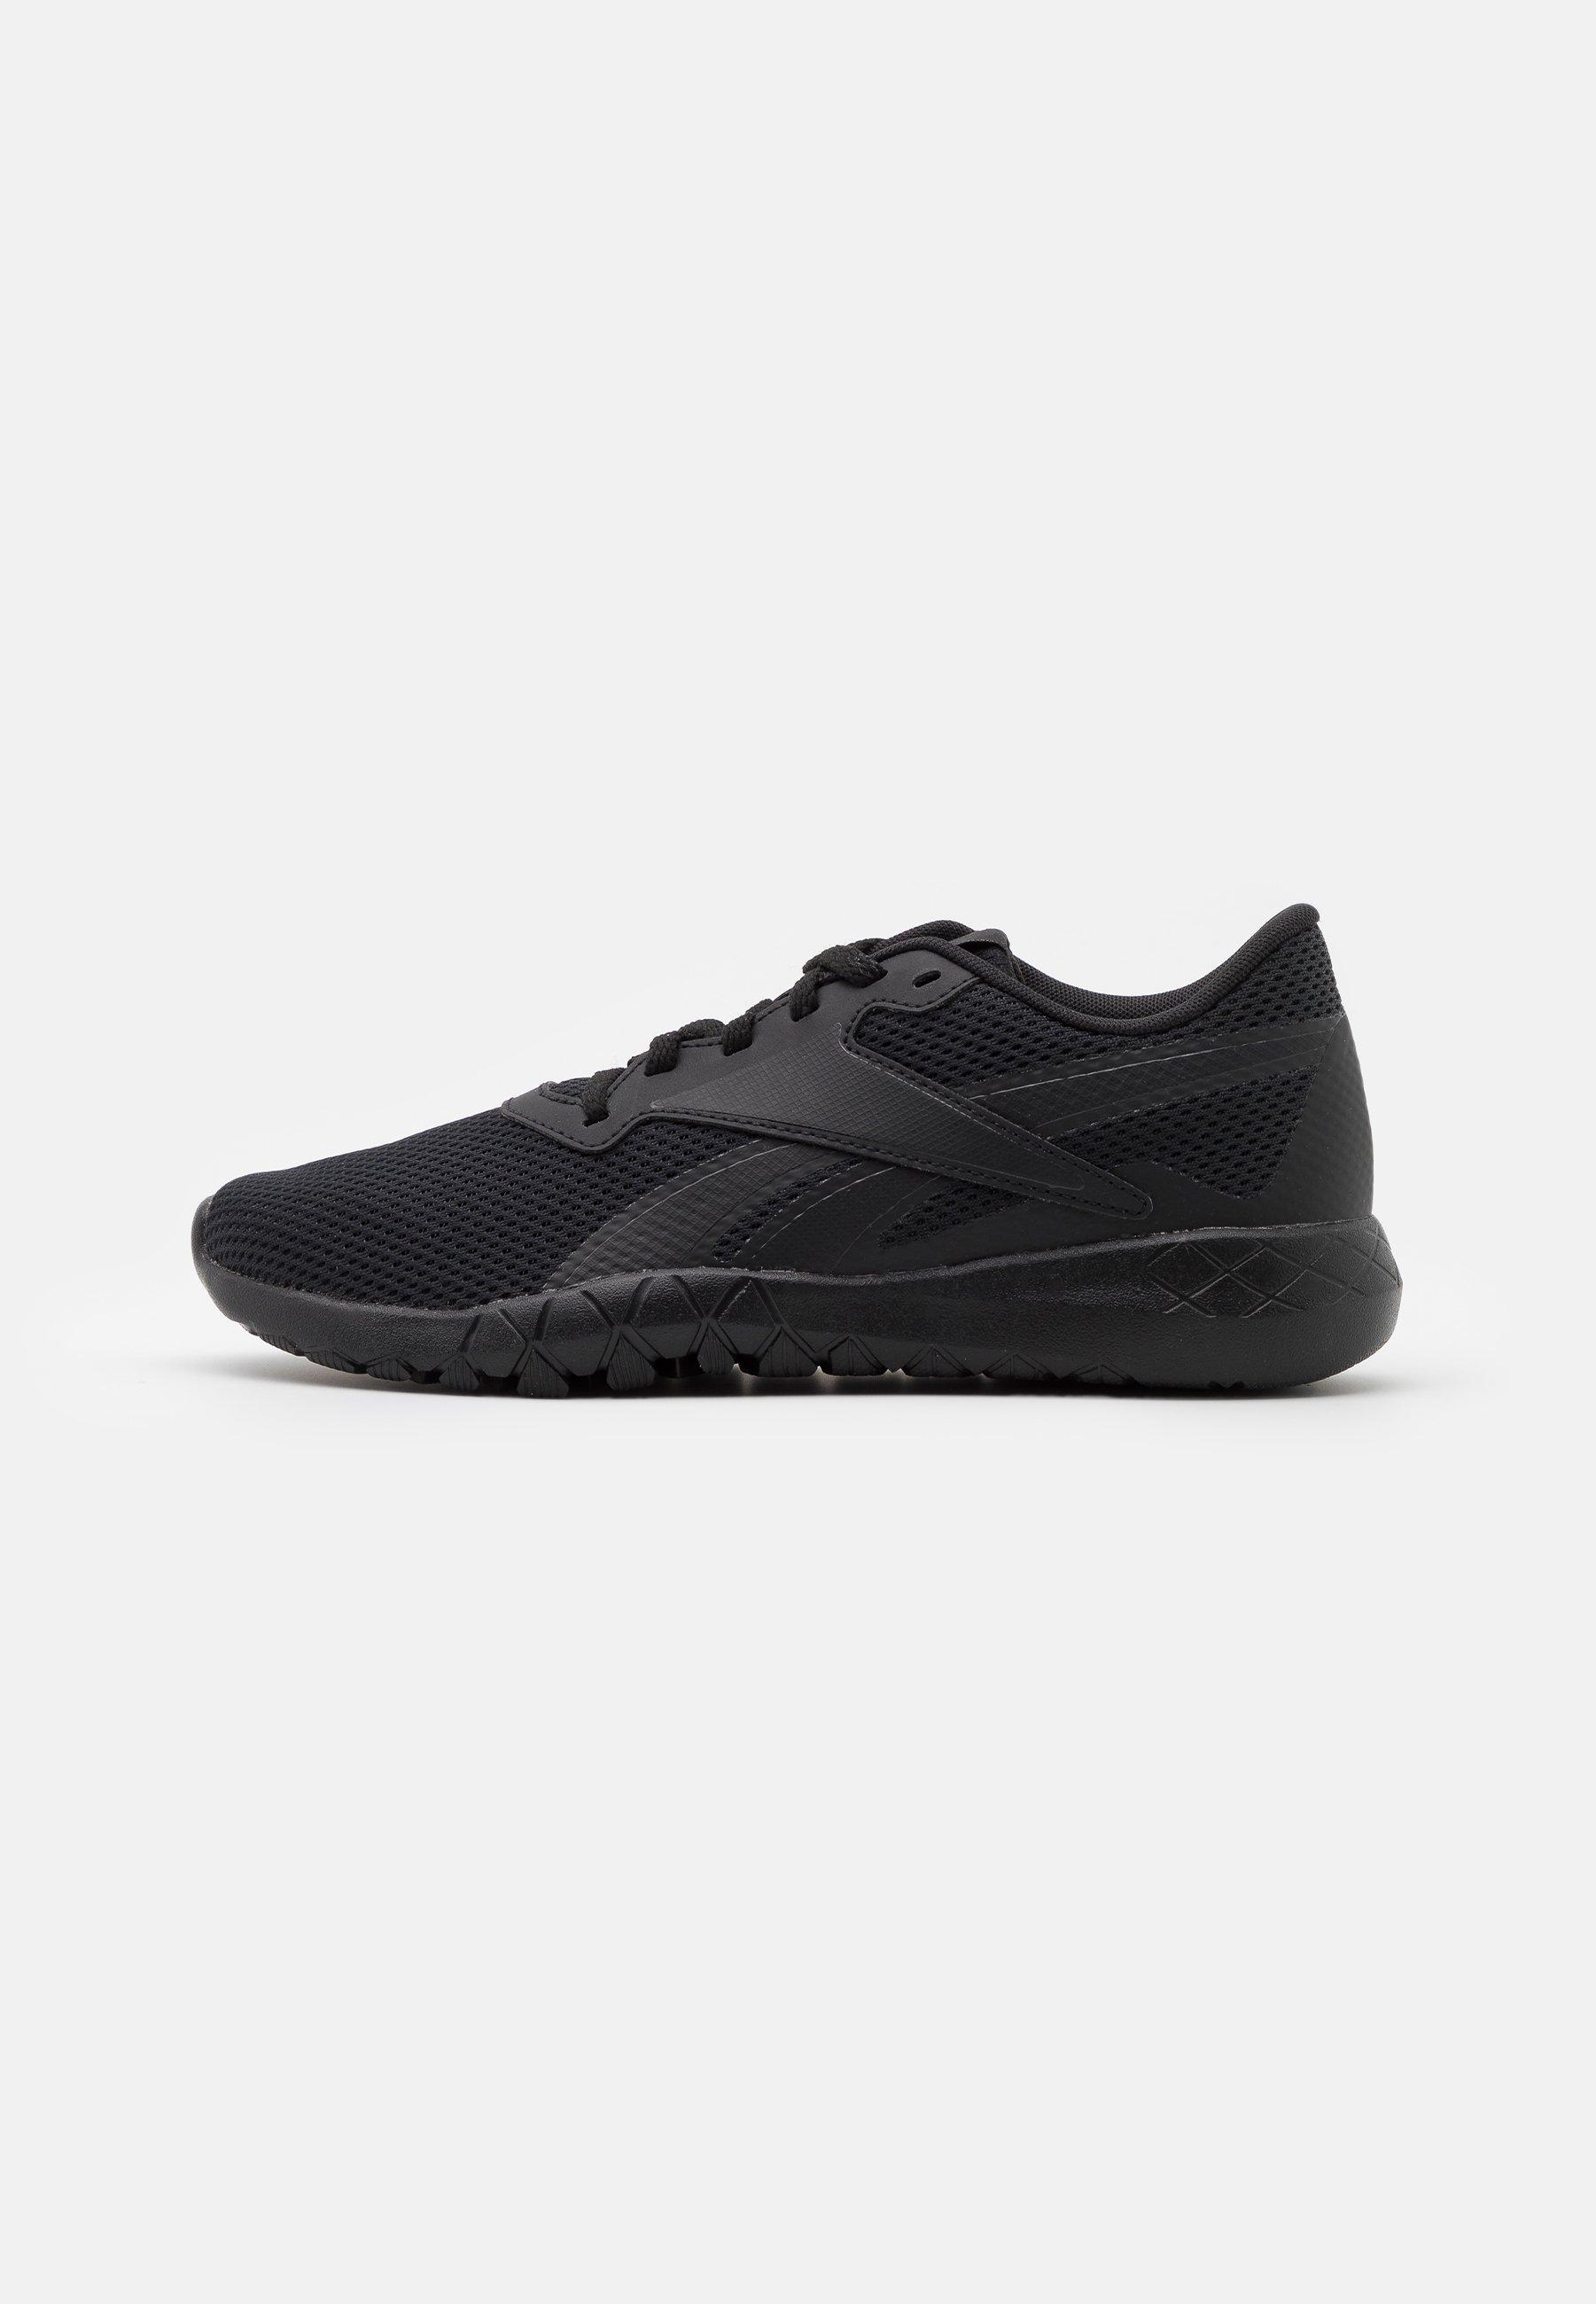 Women FLEXAGON ENERGY TR 3.0 MT - Sports shoes - core black/footwear white